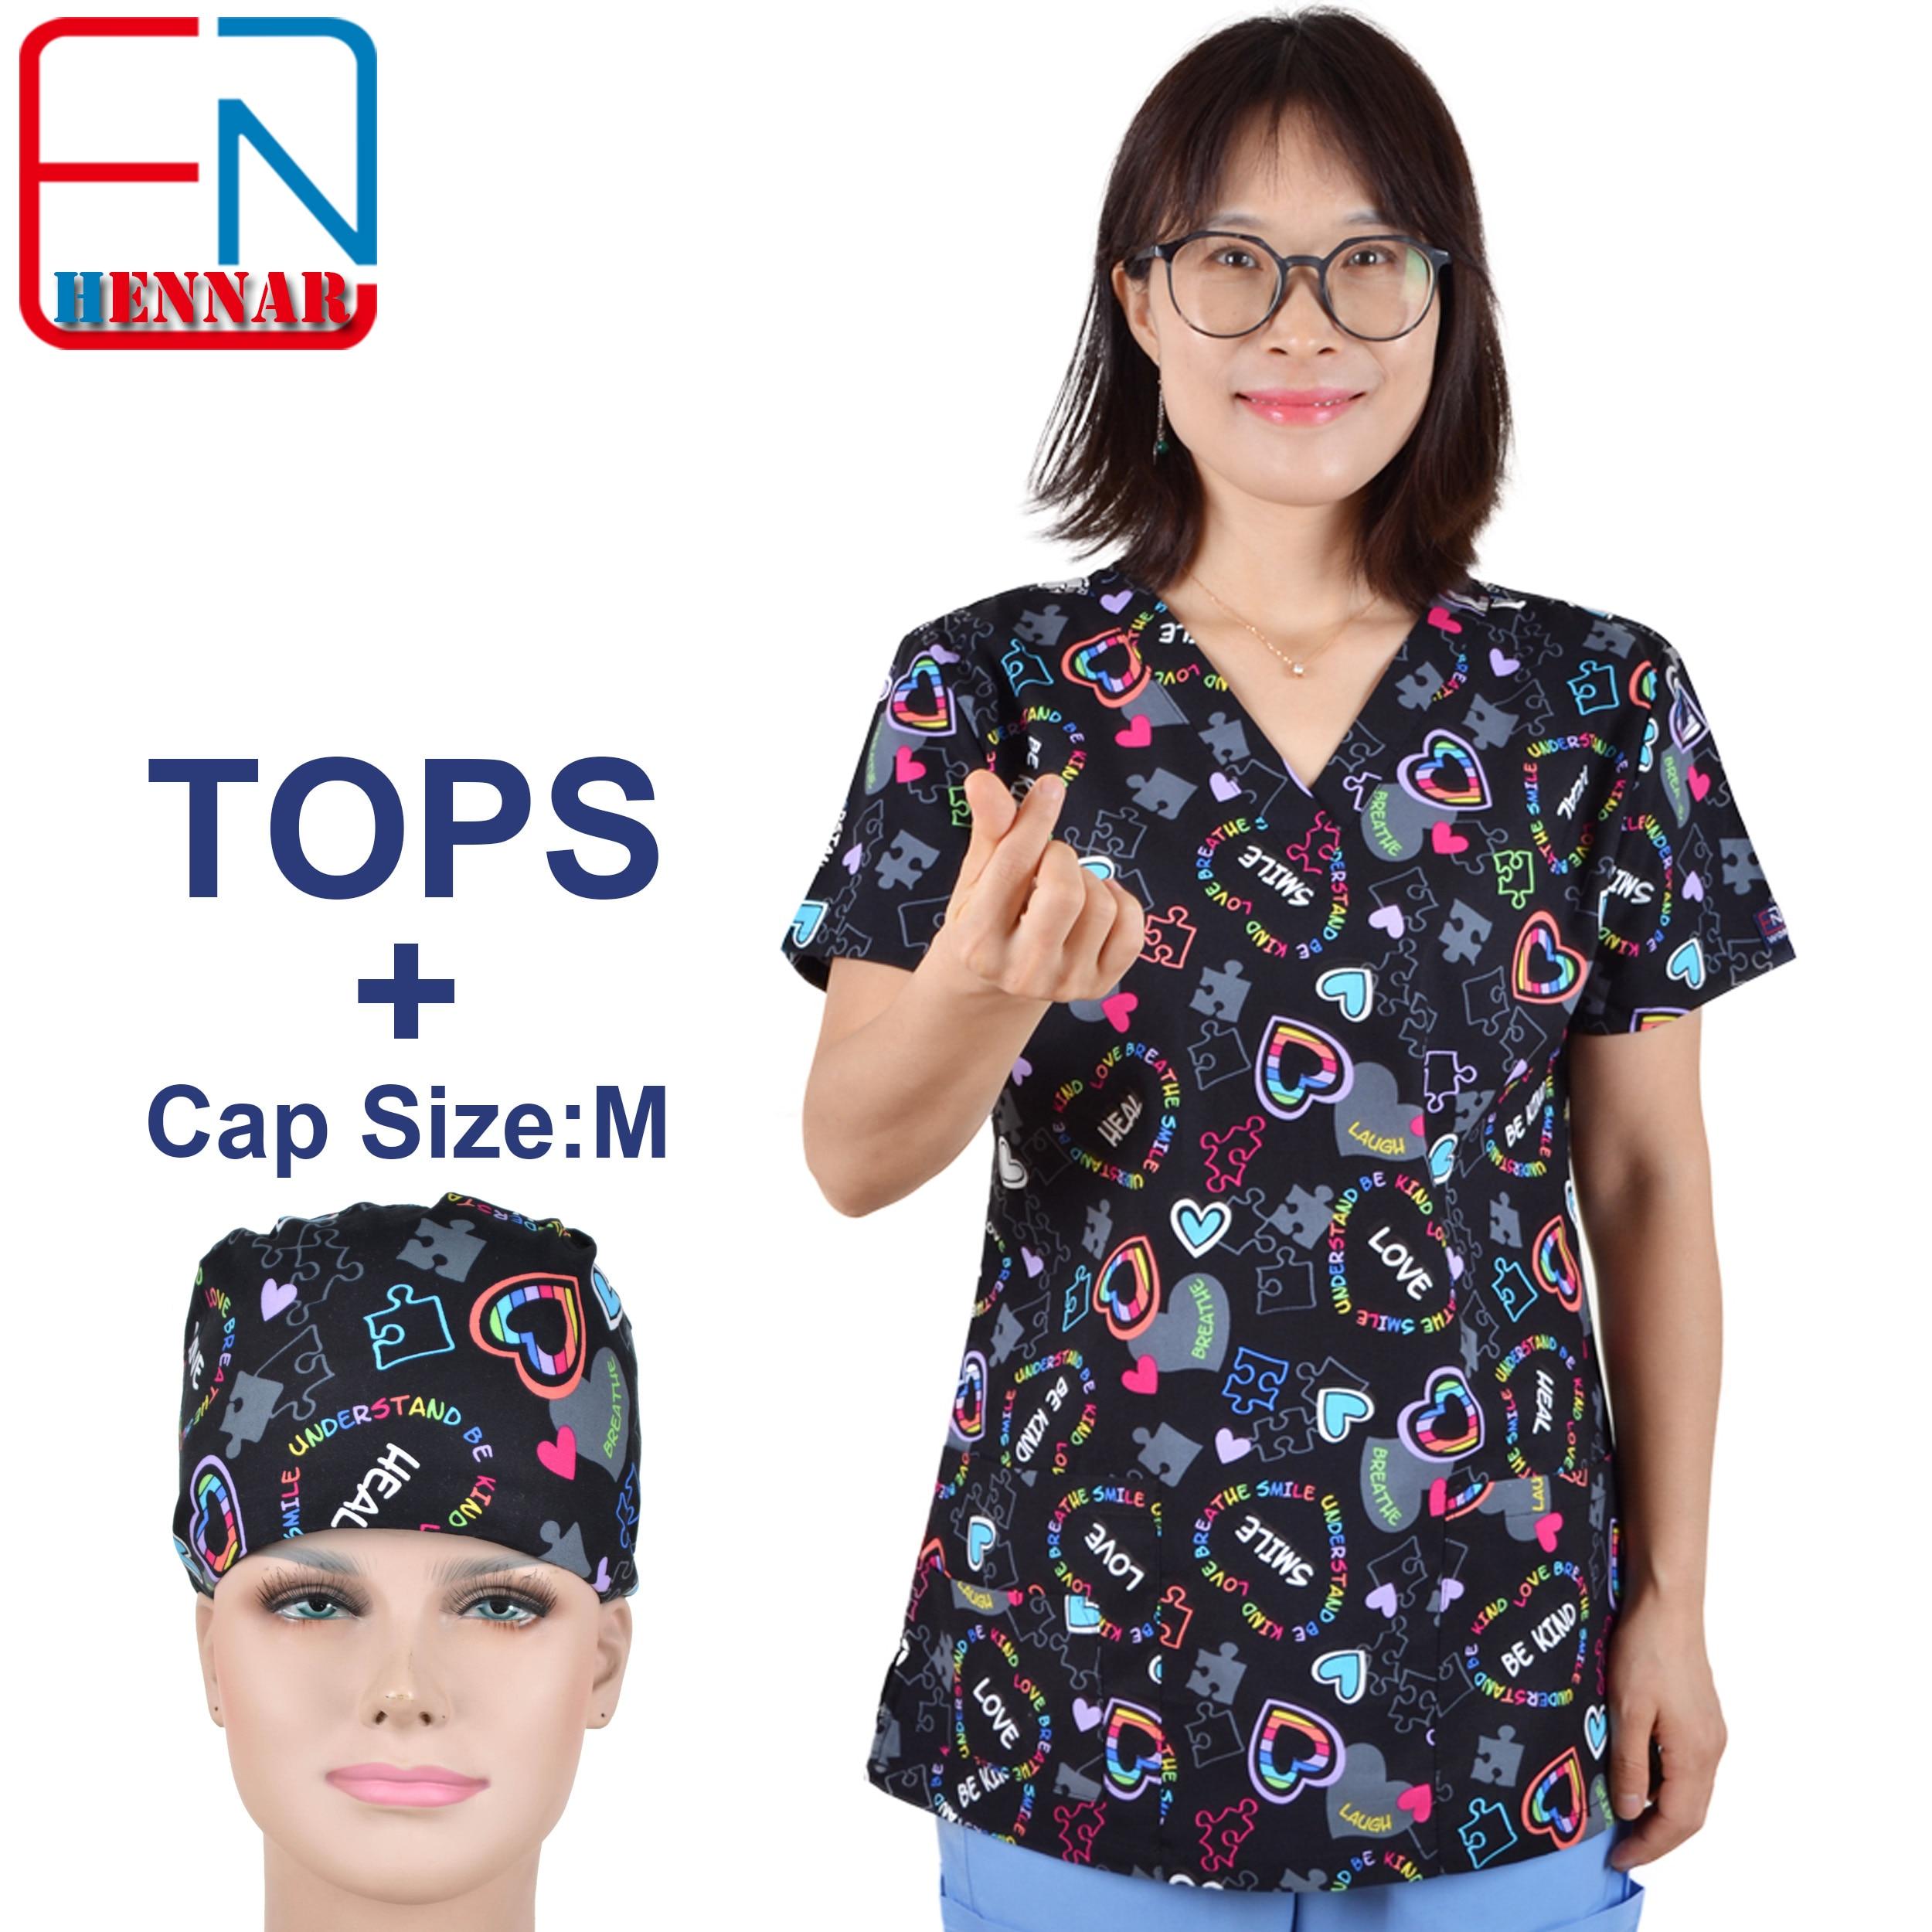 Hennar Medical Scrubs Uniforms Tops+ Caps With 100% Cotton Sizes XXS -XXXL 4 Pockets